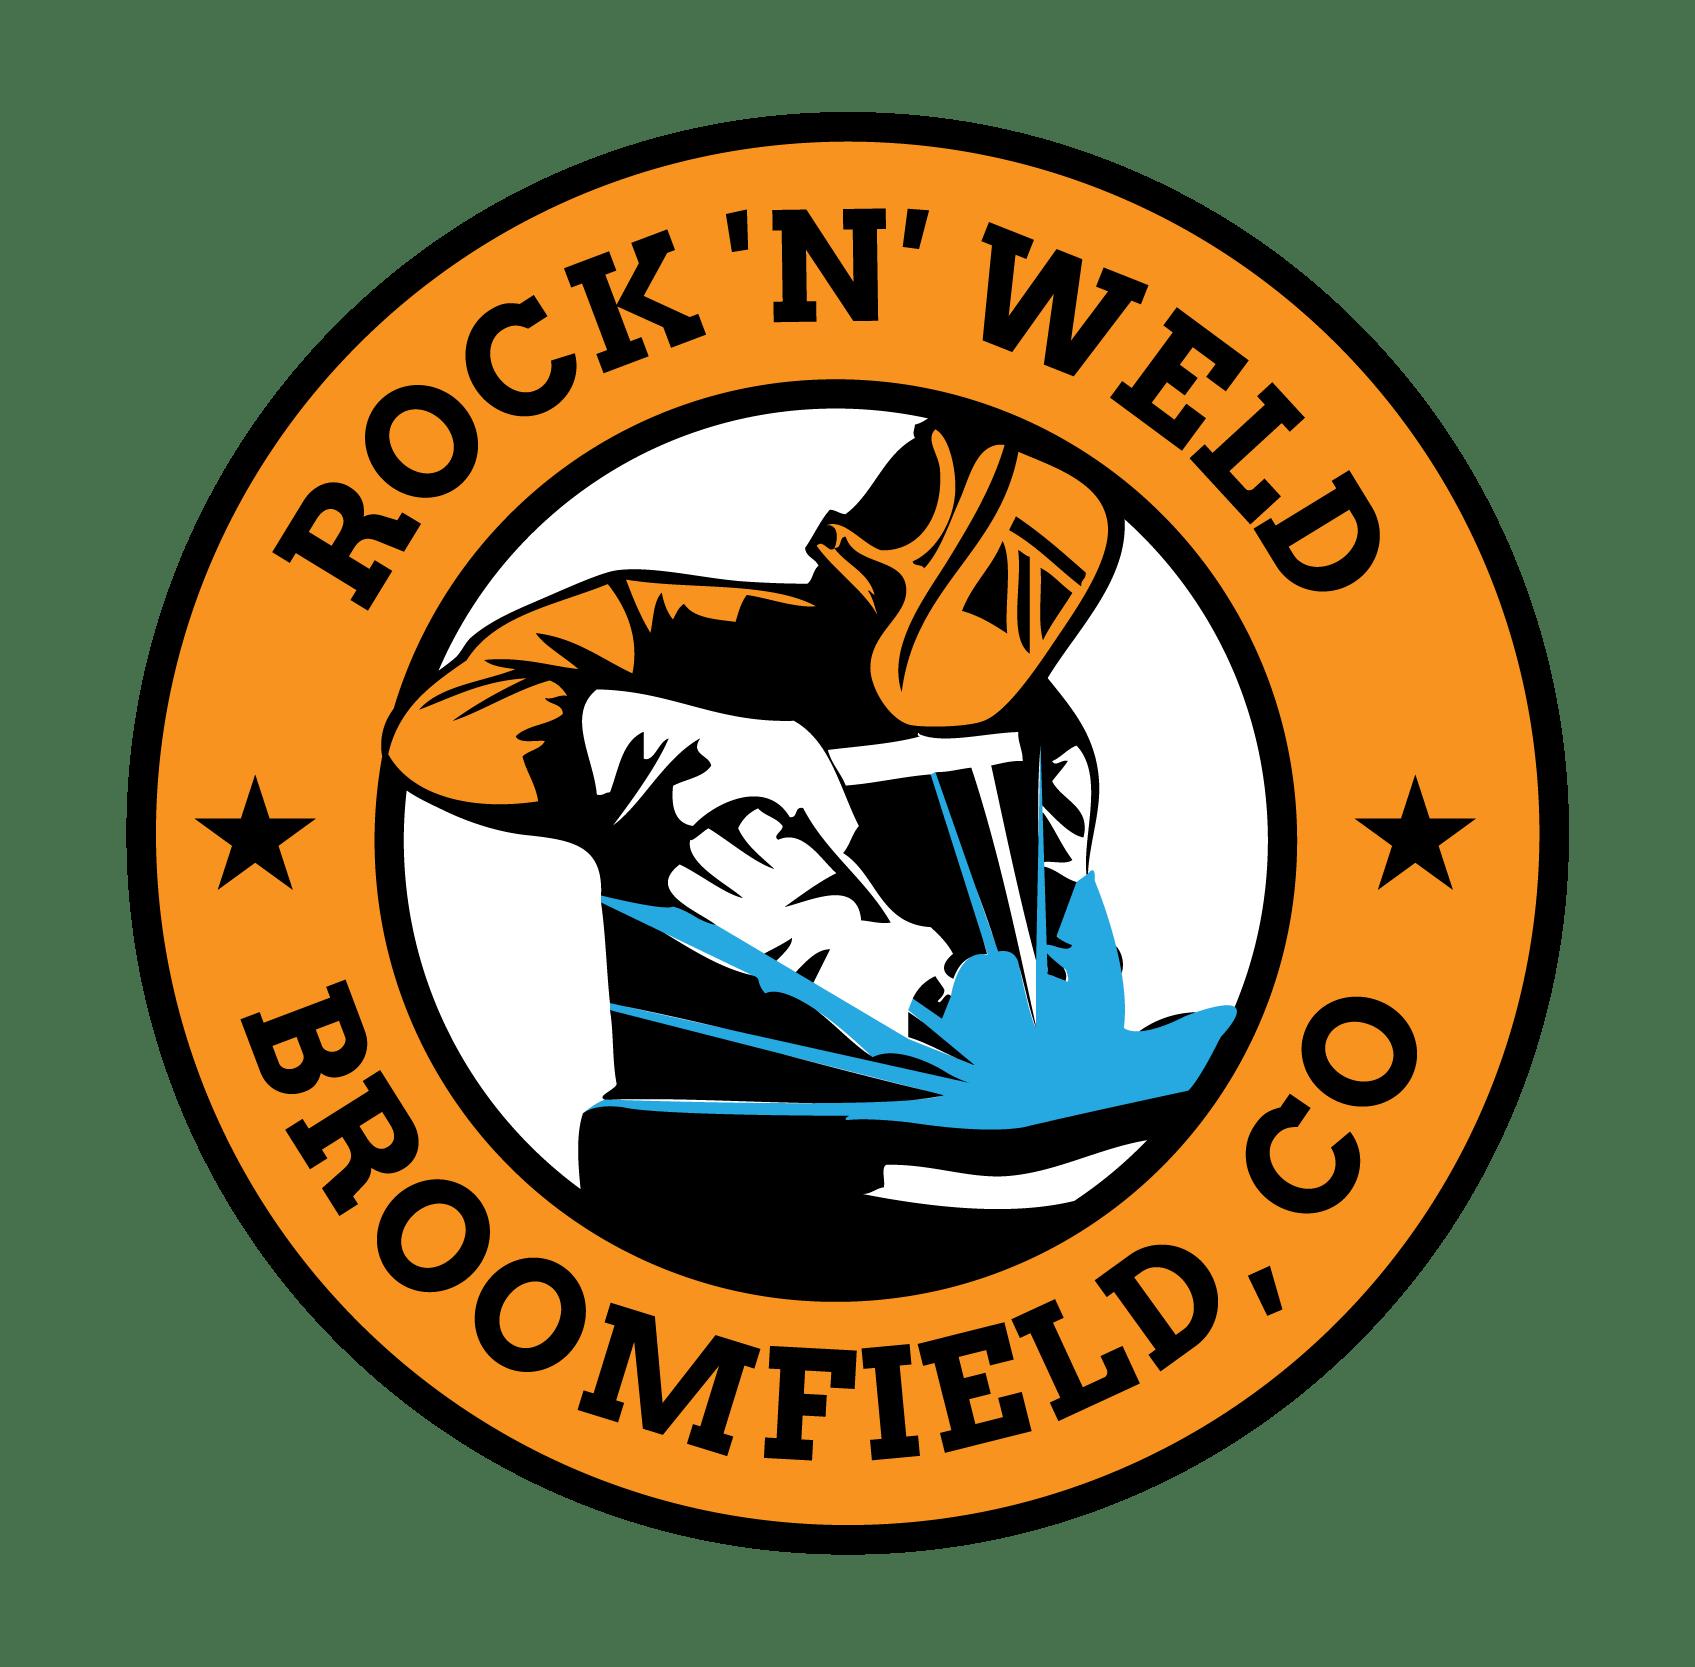 Rock 'n' Weld